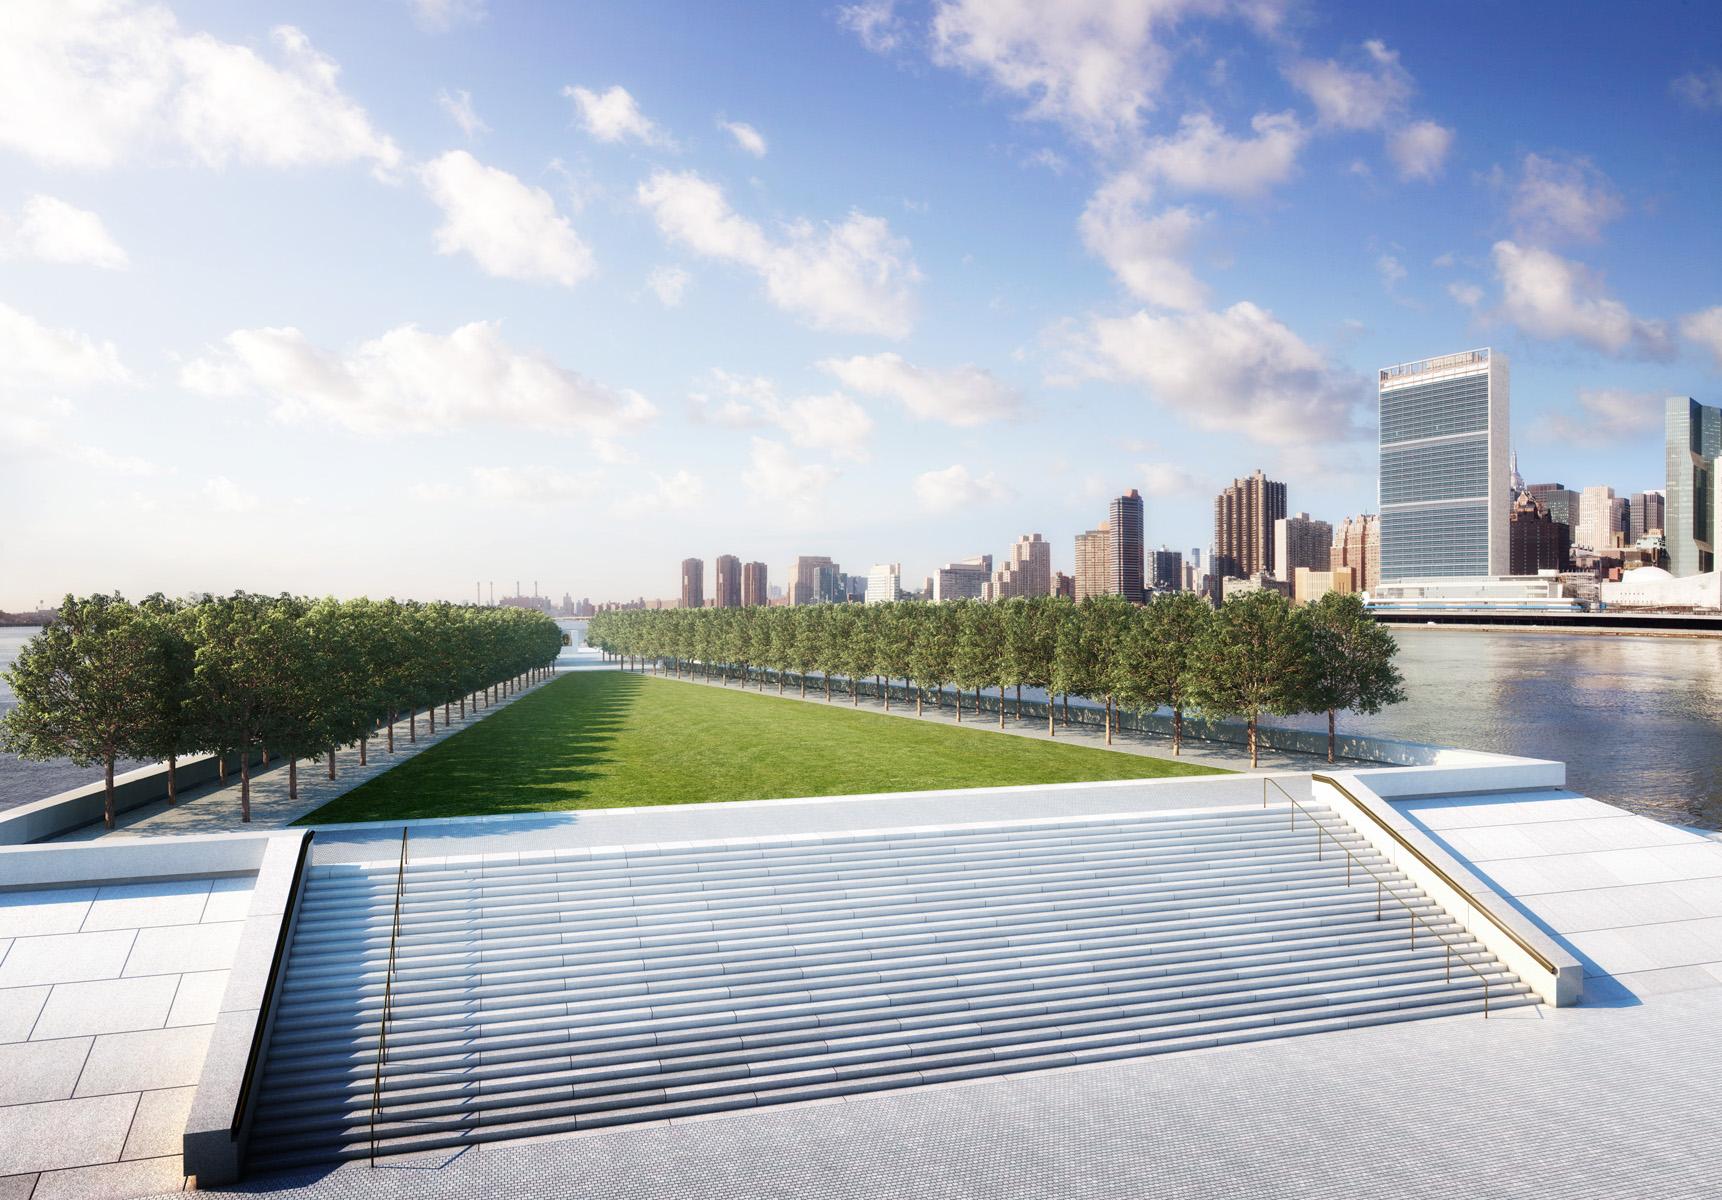 The Four Freedoms Park against the New York skyline.